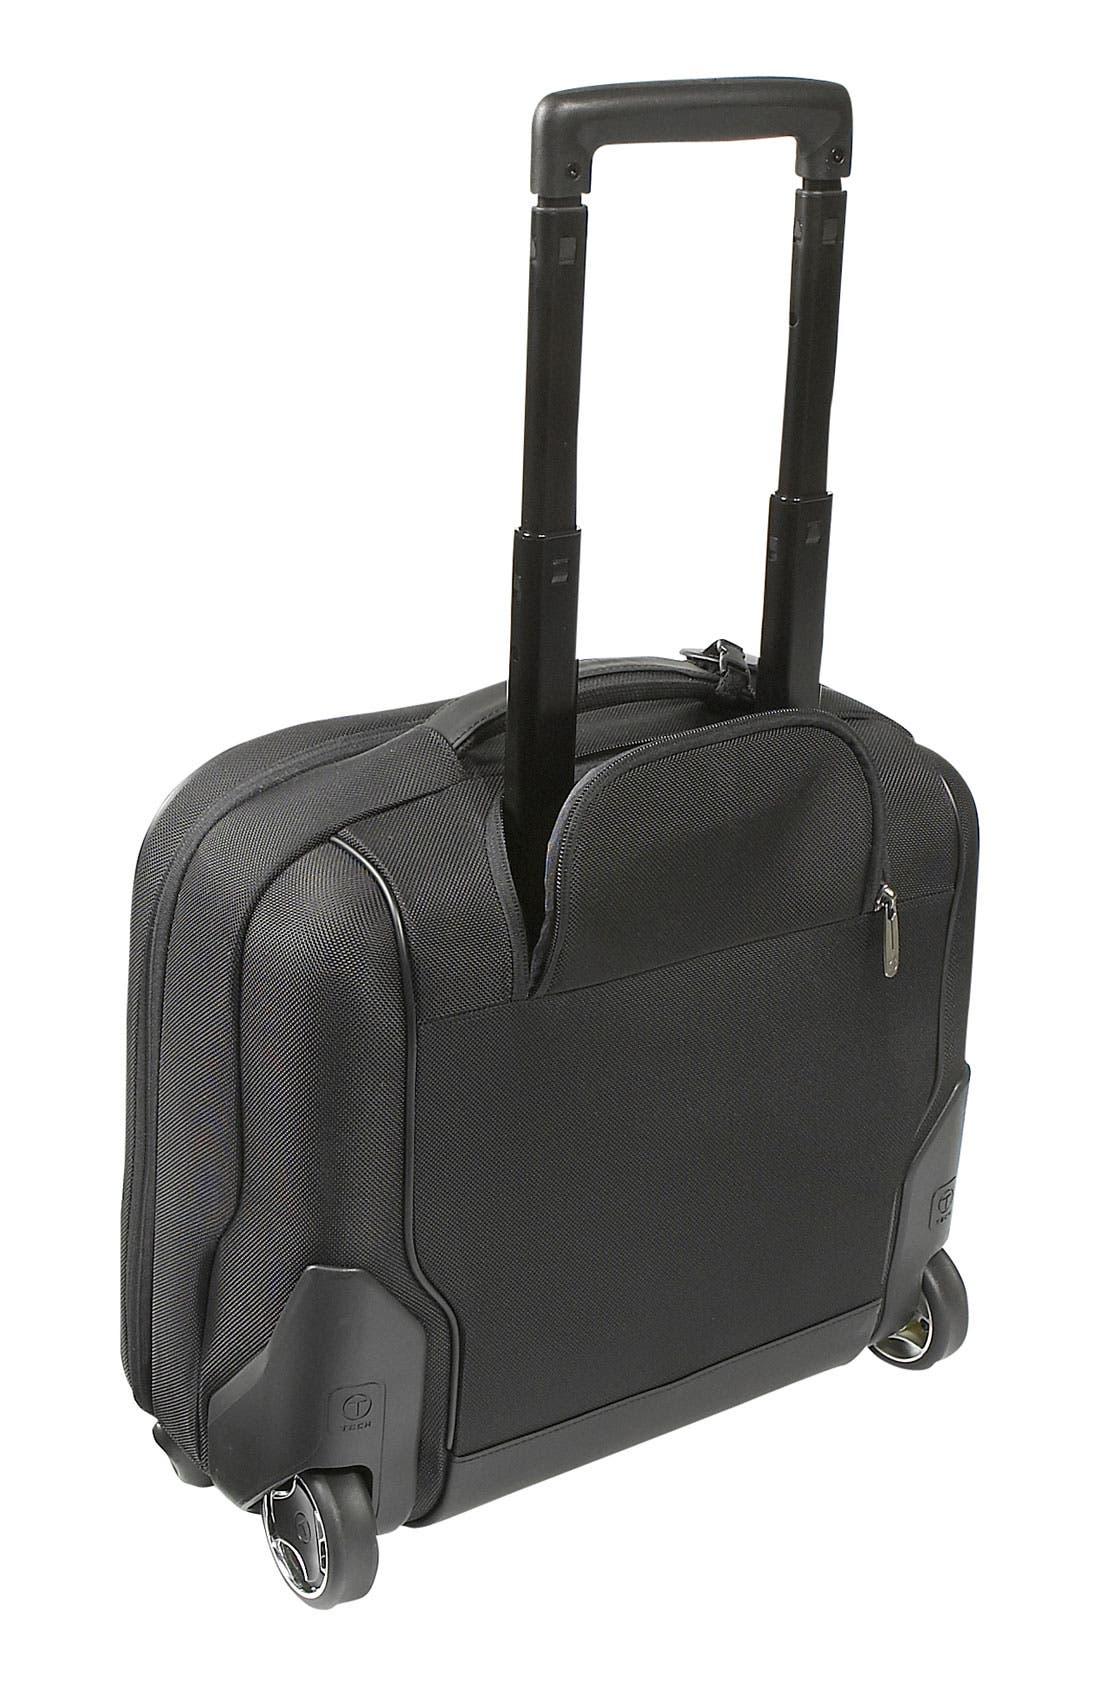 Alternate Image 2  - T-Tech by Tumi 'Presidio MacArthur' Wheeled Compact Laptop Briefcase